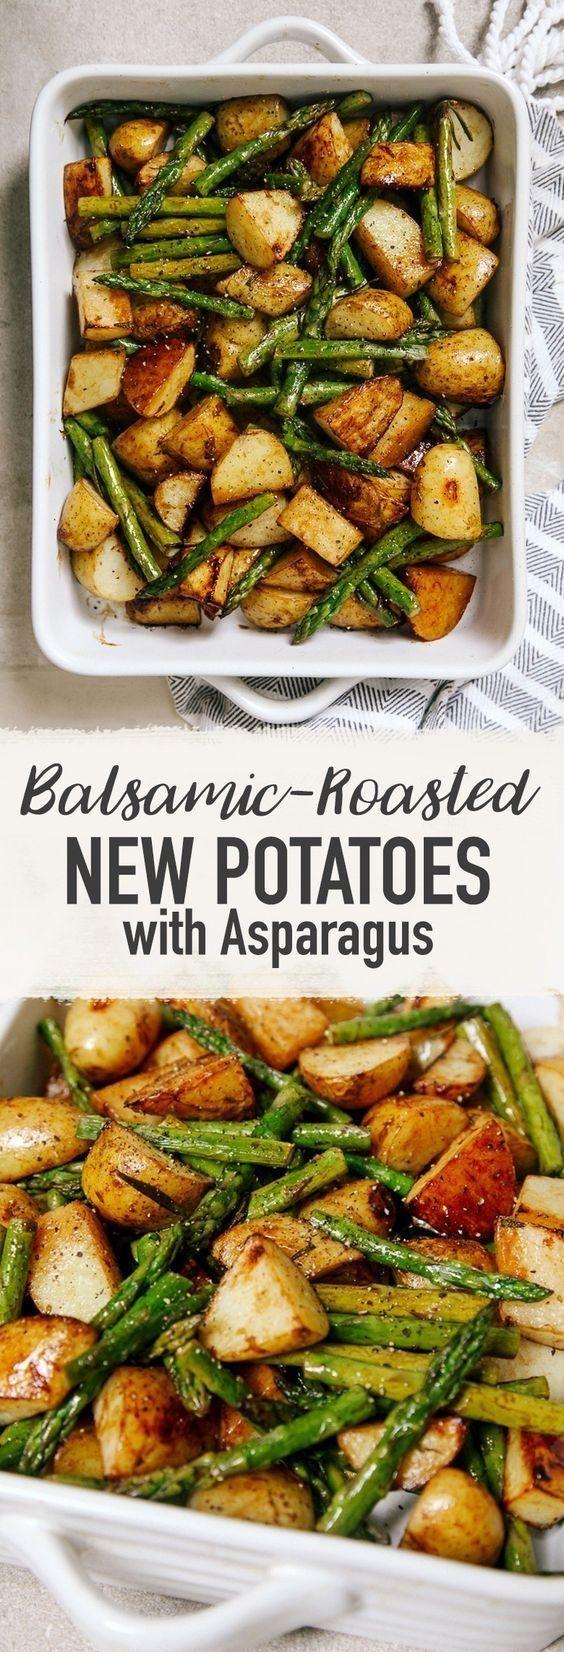 Balsamic Roasted New Potatoes With Asparagus – Essen & Trinken – Gesund und lecker?! eat and drink – healthy and tasty!